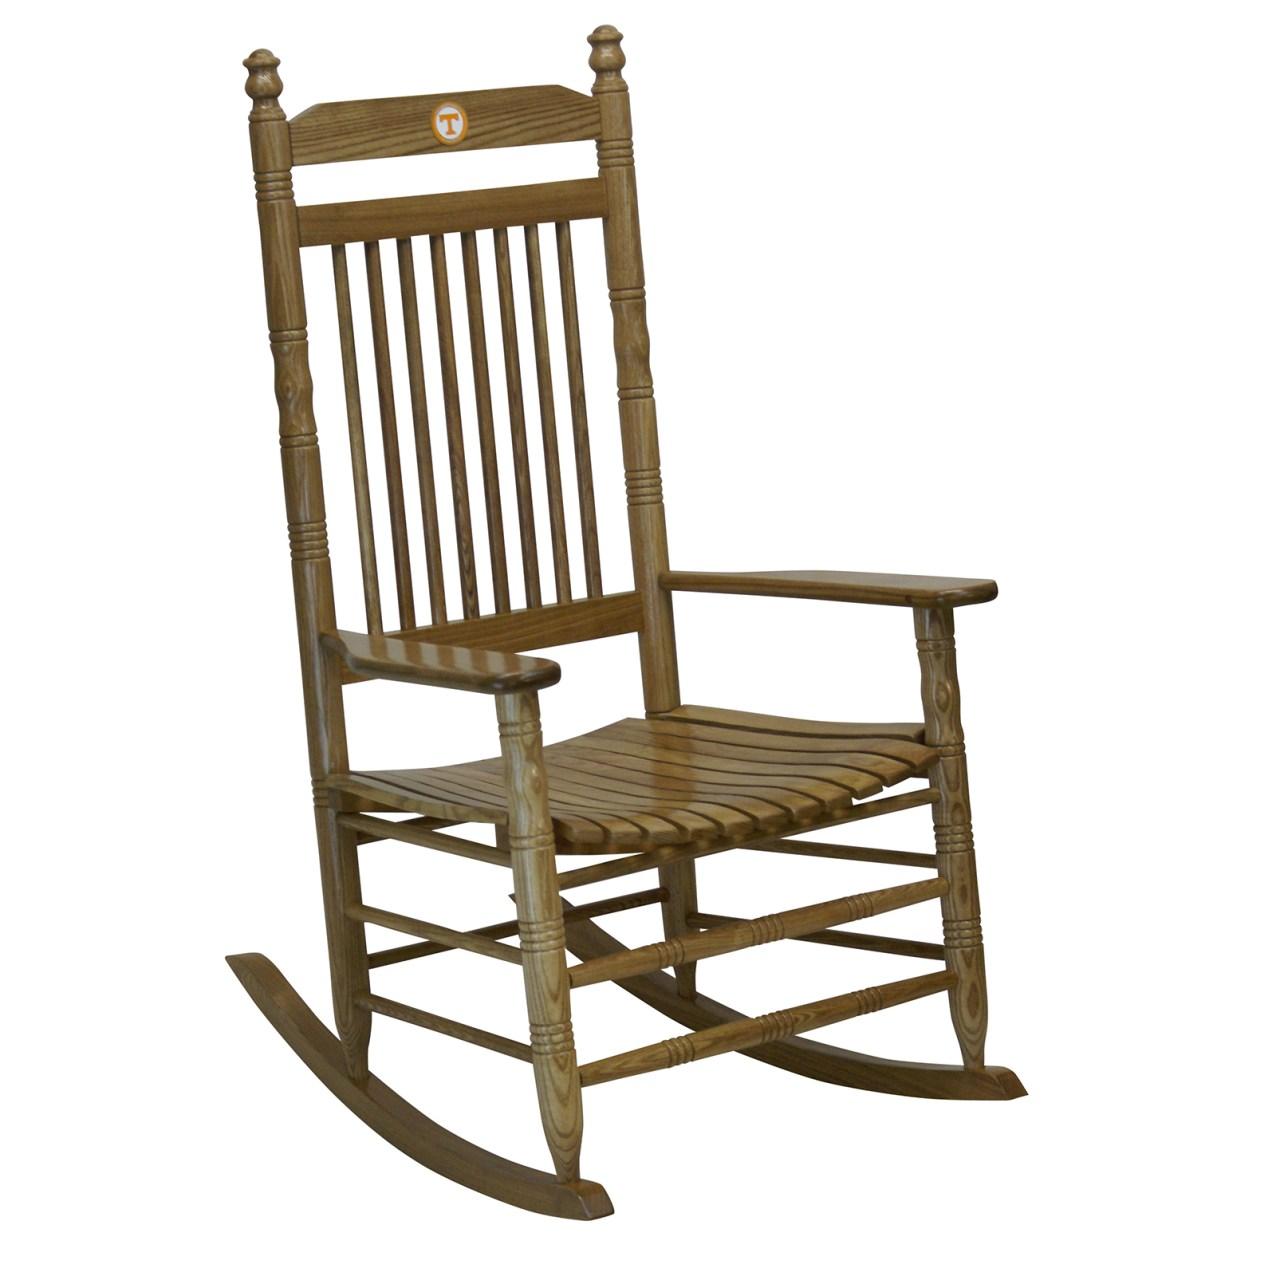 Hardwood Rocking Chair - Tennessee